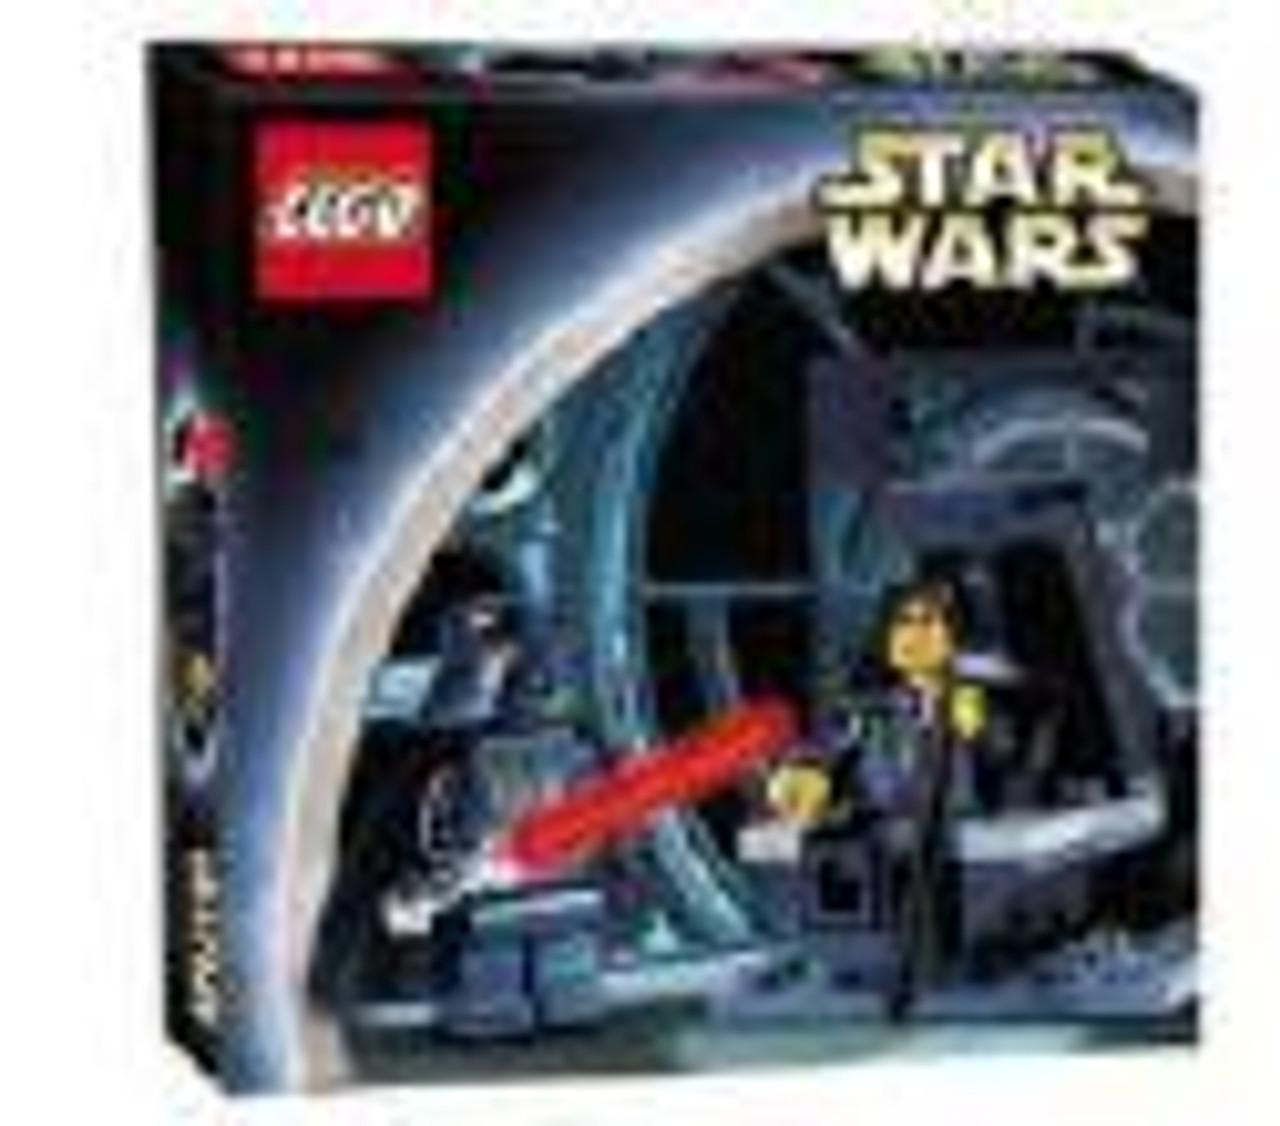 LEGO Star Wars Return of the Jedi Final Duel I Set #7200 [New]